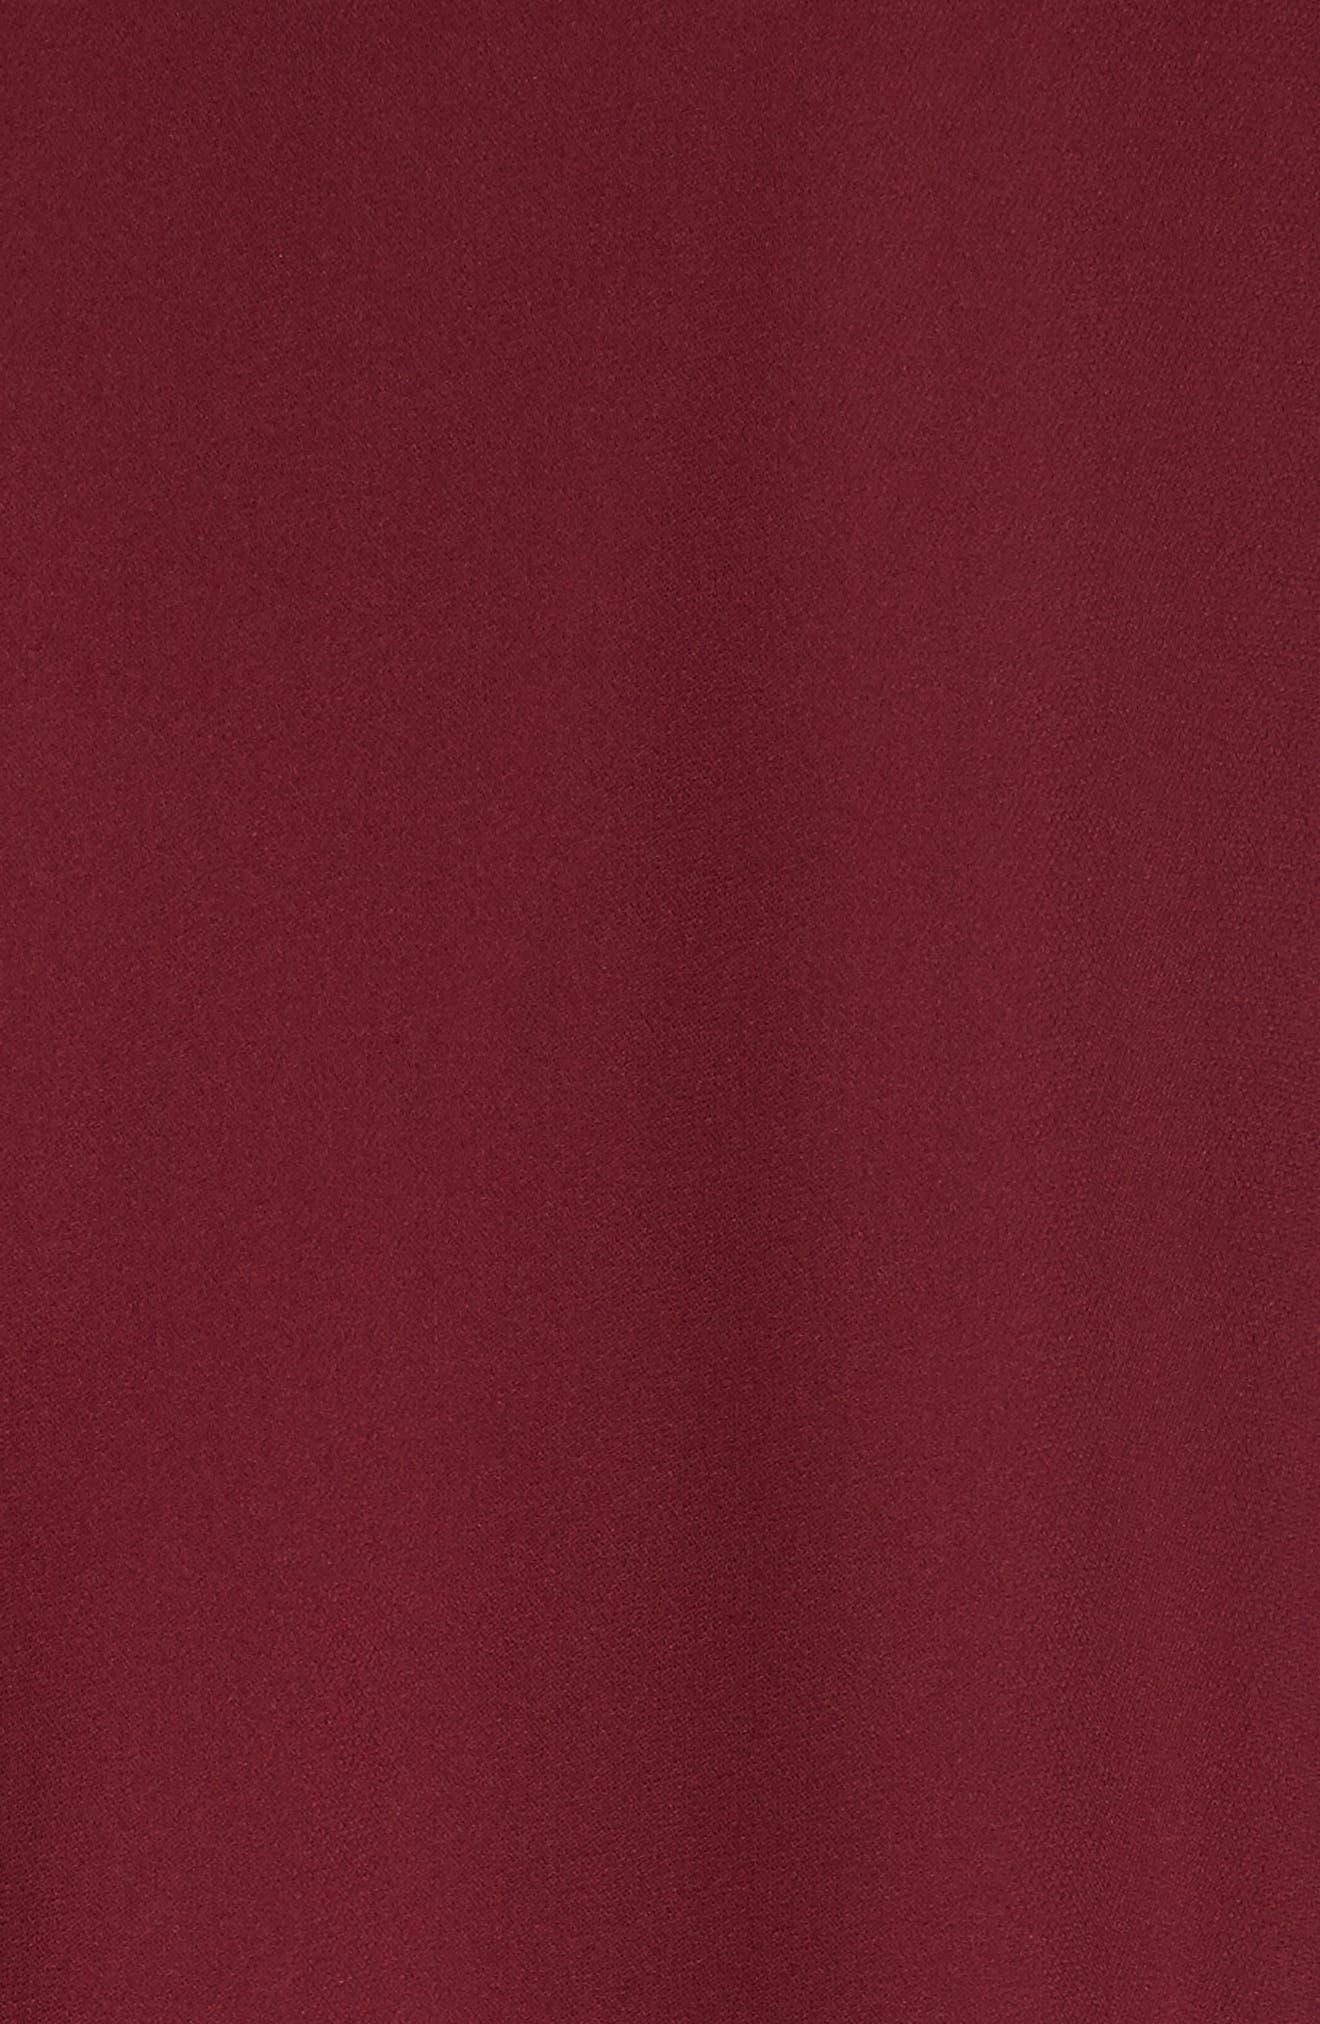 Badgley Mischka Couture Embellished Cuff Silk Caftan,                             Alternate thumbnail 6, color,                             Burgundy